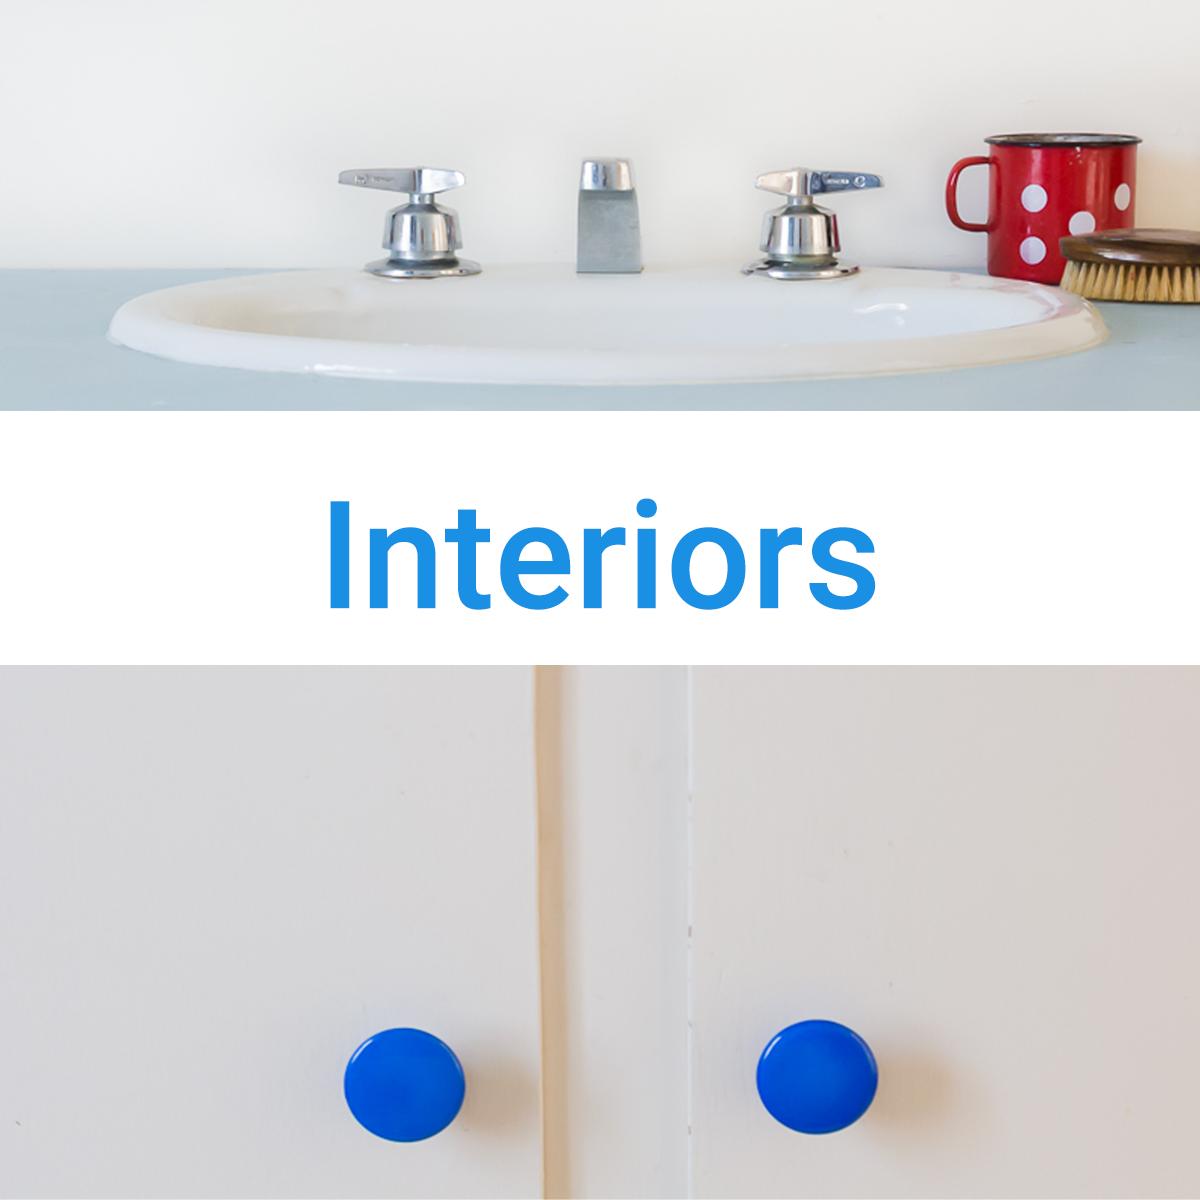 interiors-roberto-light-blue.png